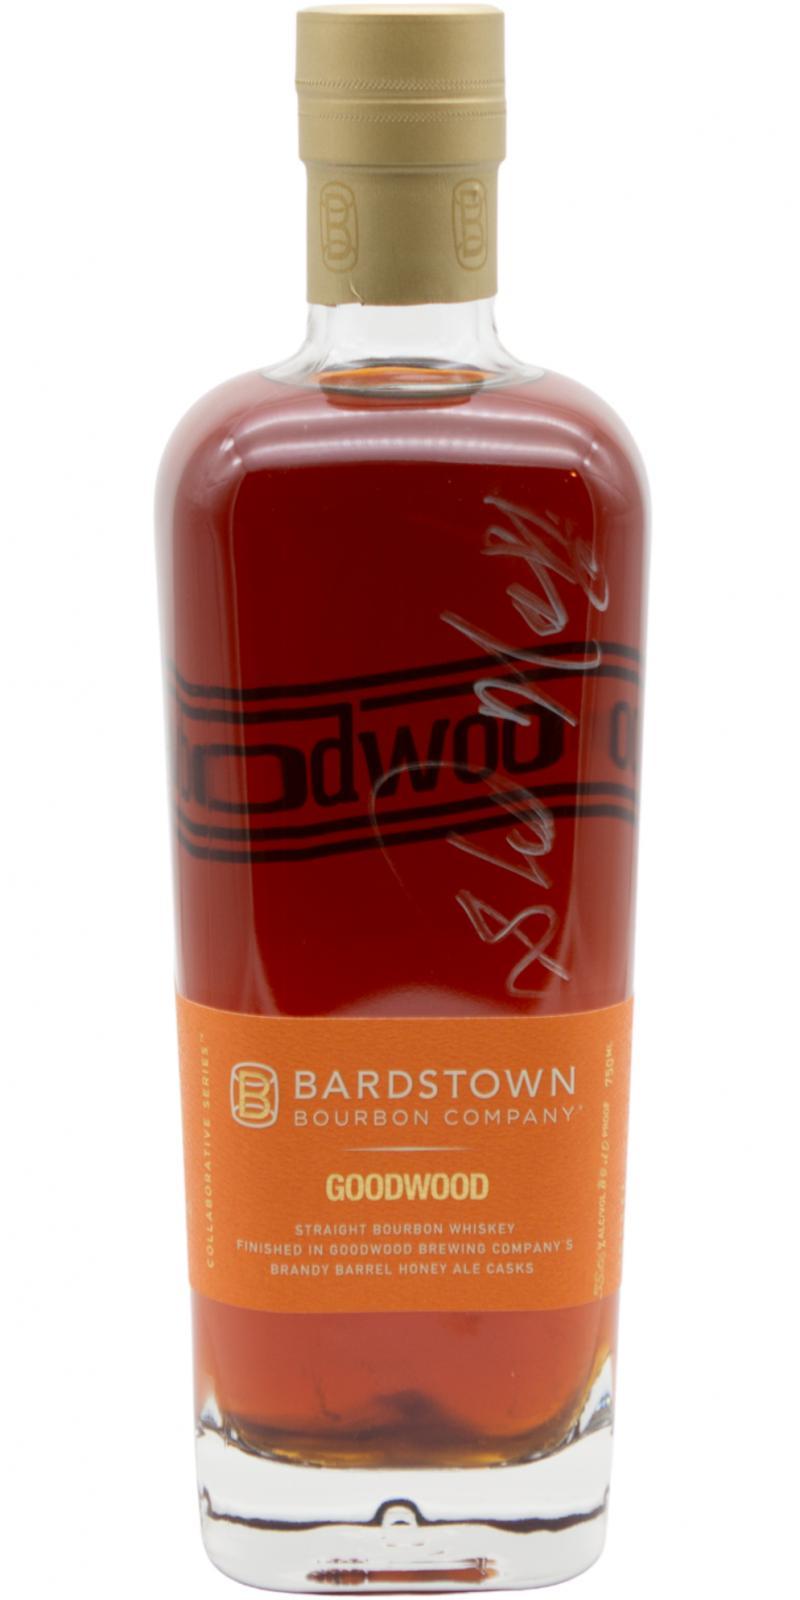 Bardstown Bourbon Company Goodwood